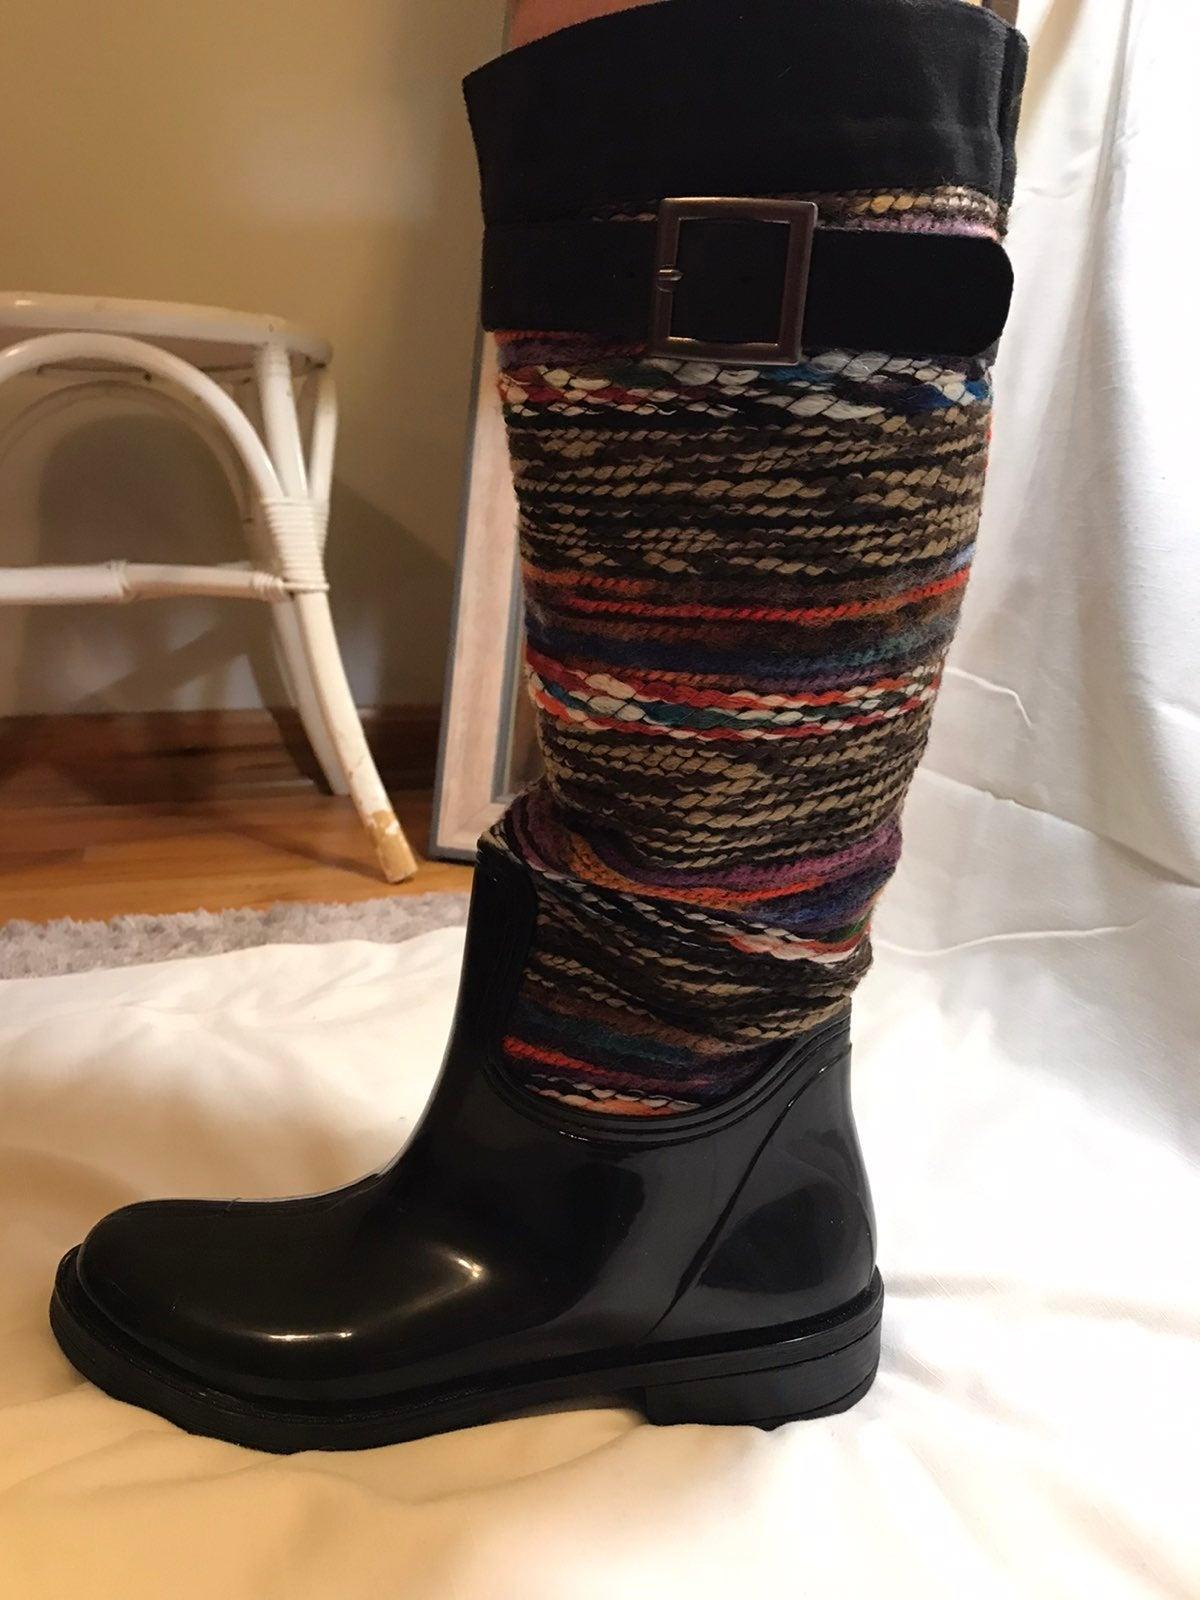 NWT Nomad Size 9 Rain Boots